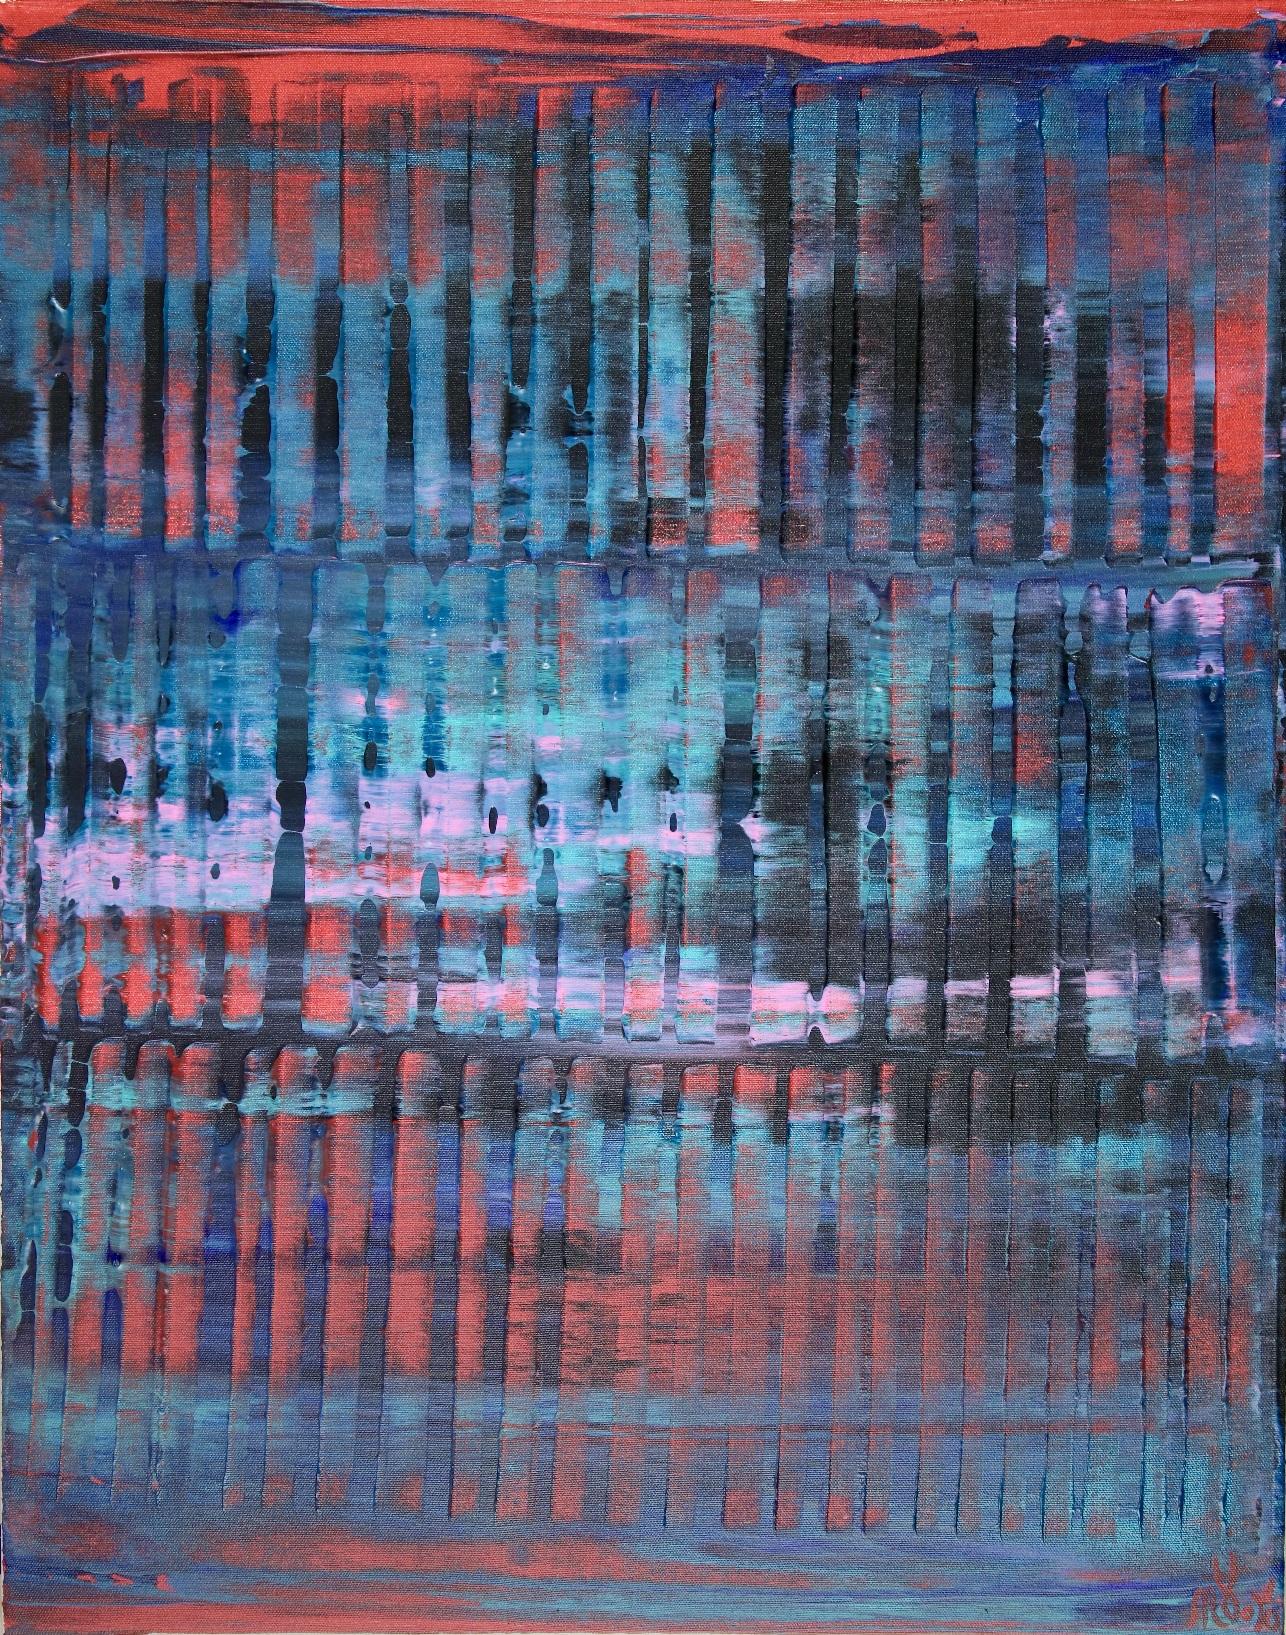 Nighttime Shadows and Lights (22x28) by Nestor Toro 2019